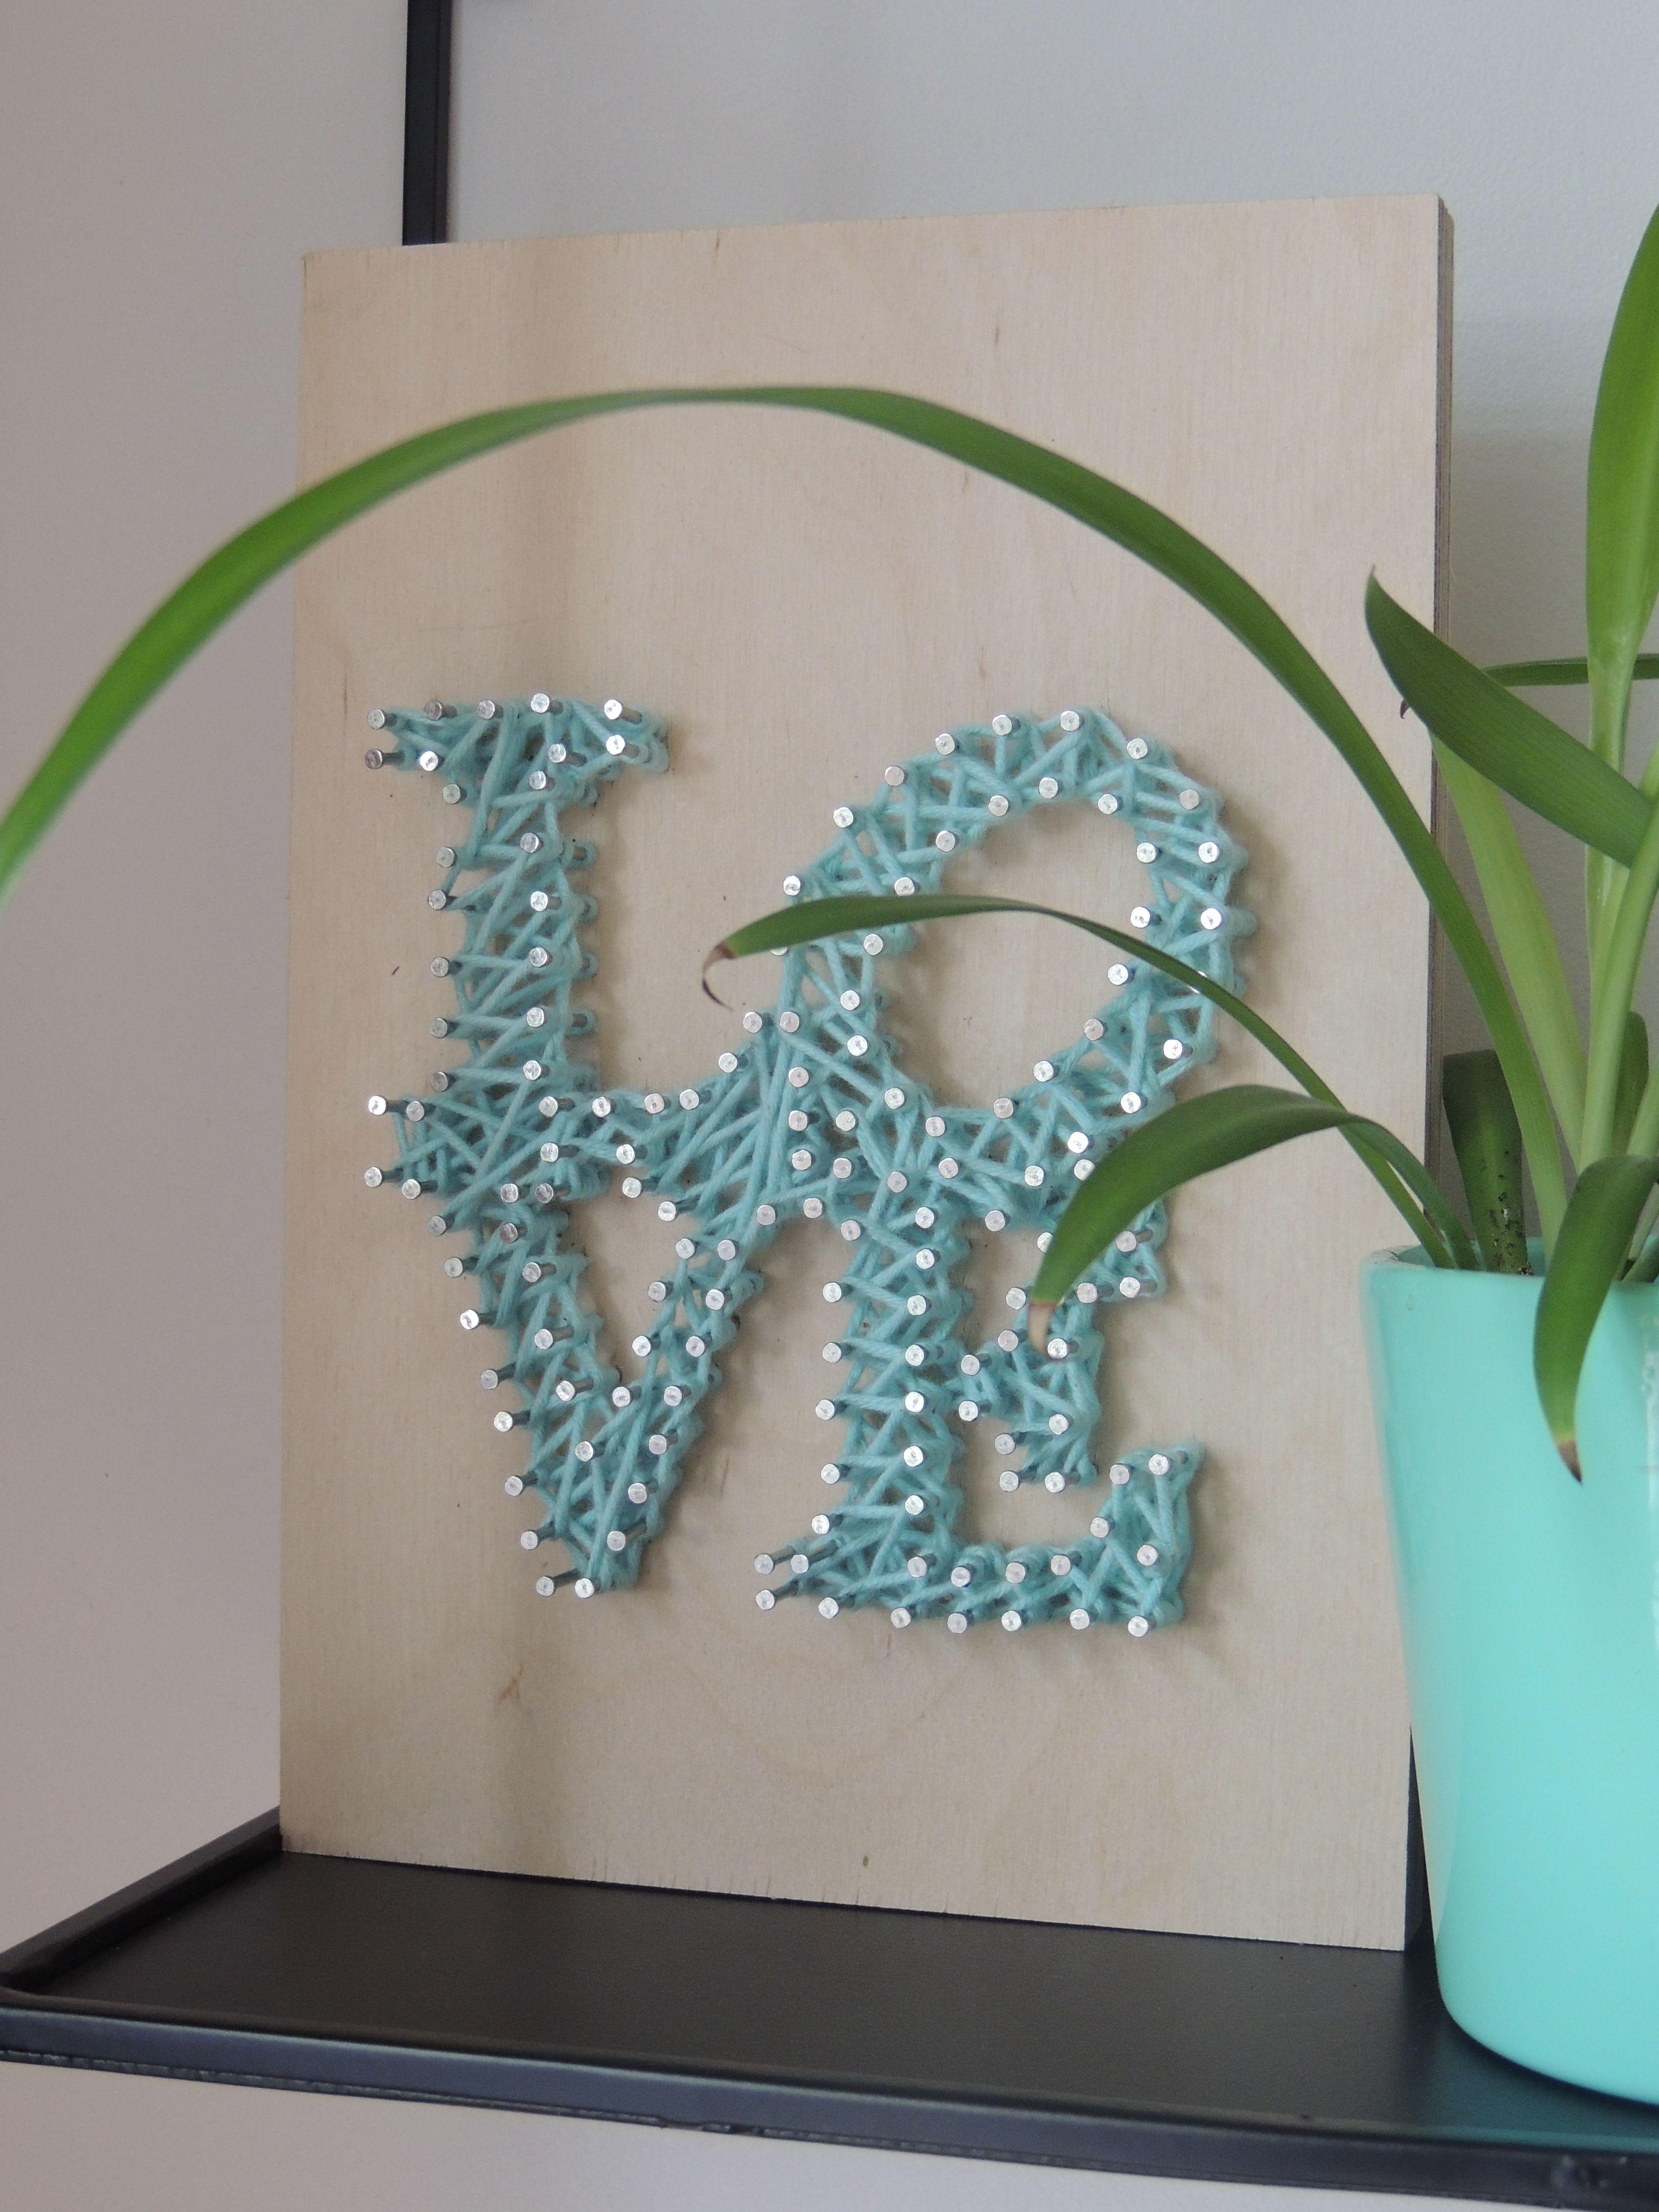 DIY spijkerkunst \'love\' - KVLV - aanbod2018 - Spijkerkunst | Pinterest